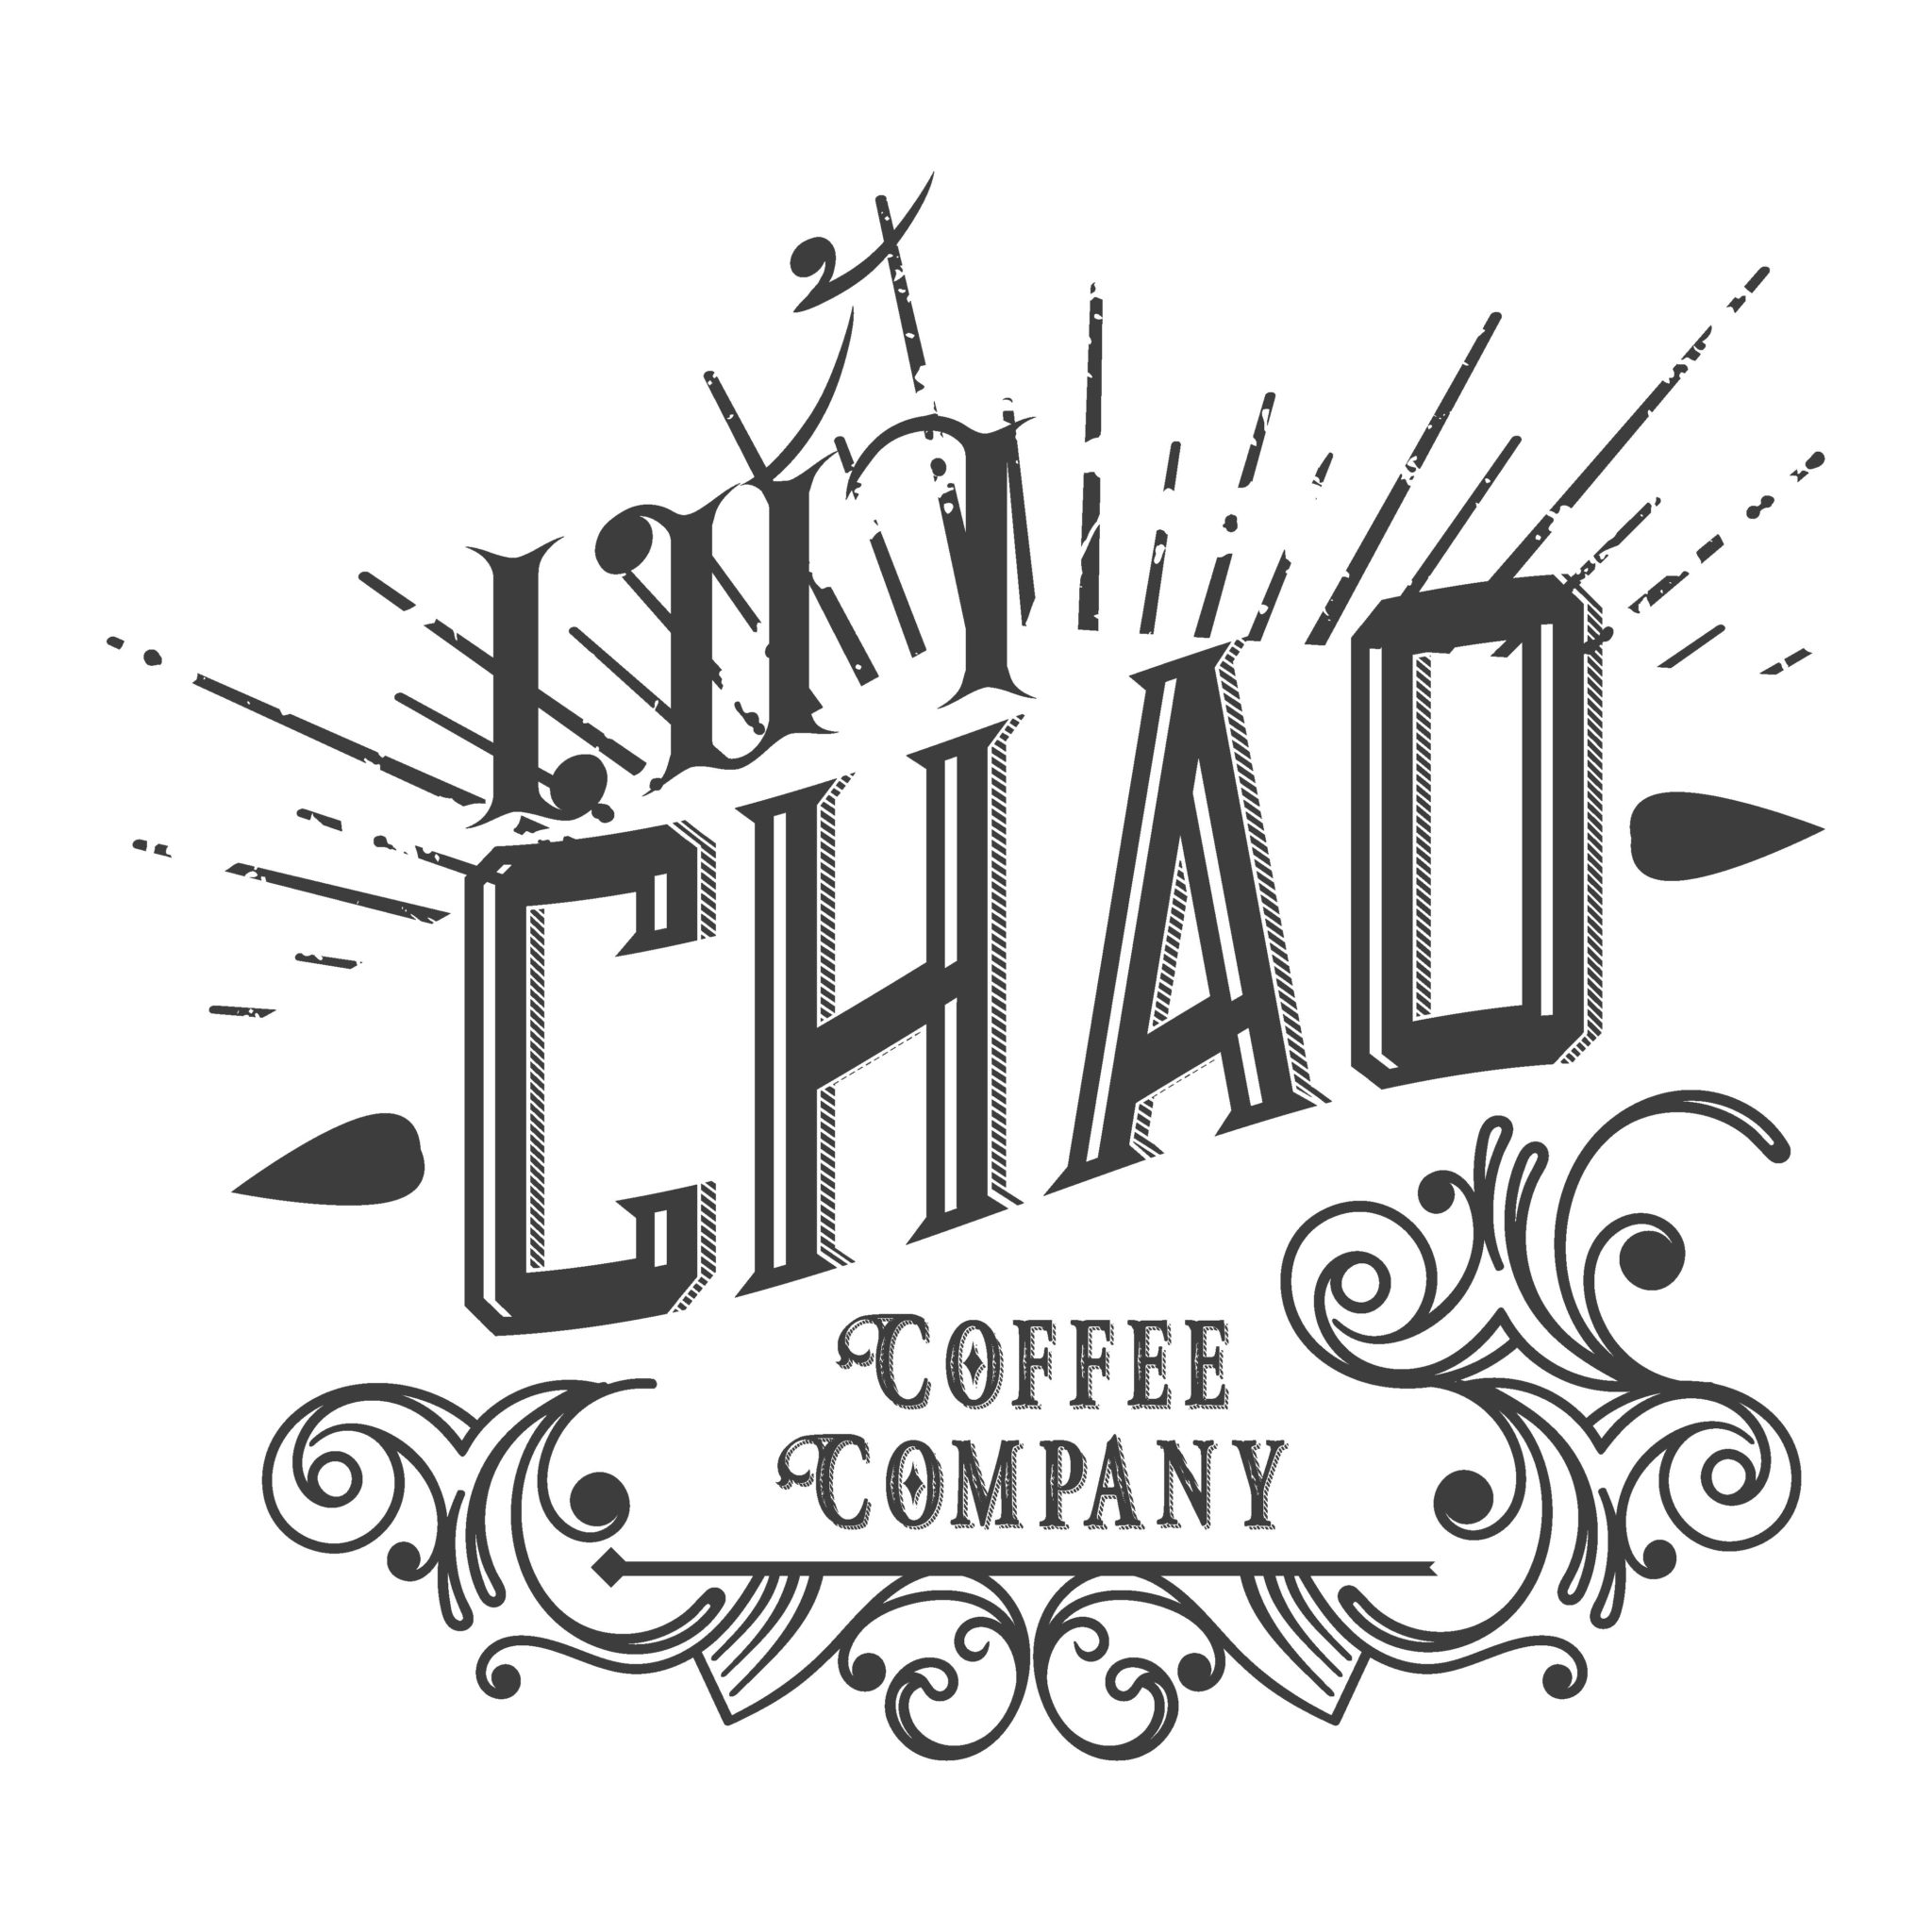 CHAO logo by Suzaku Productions